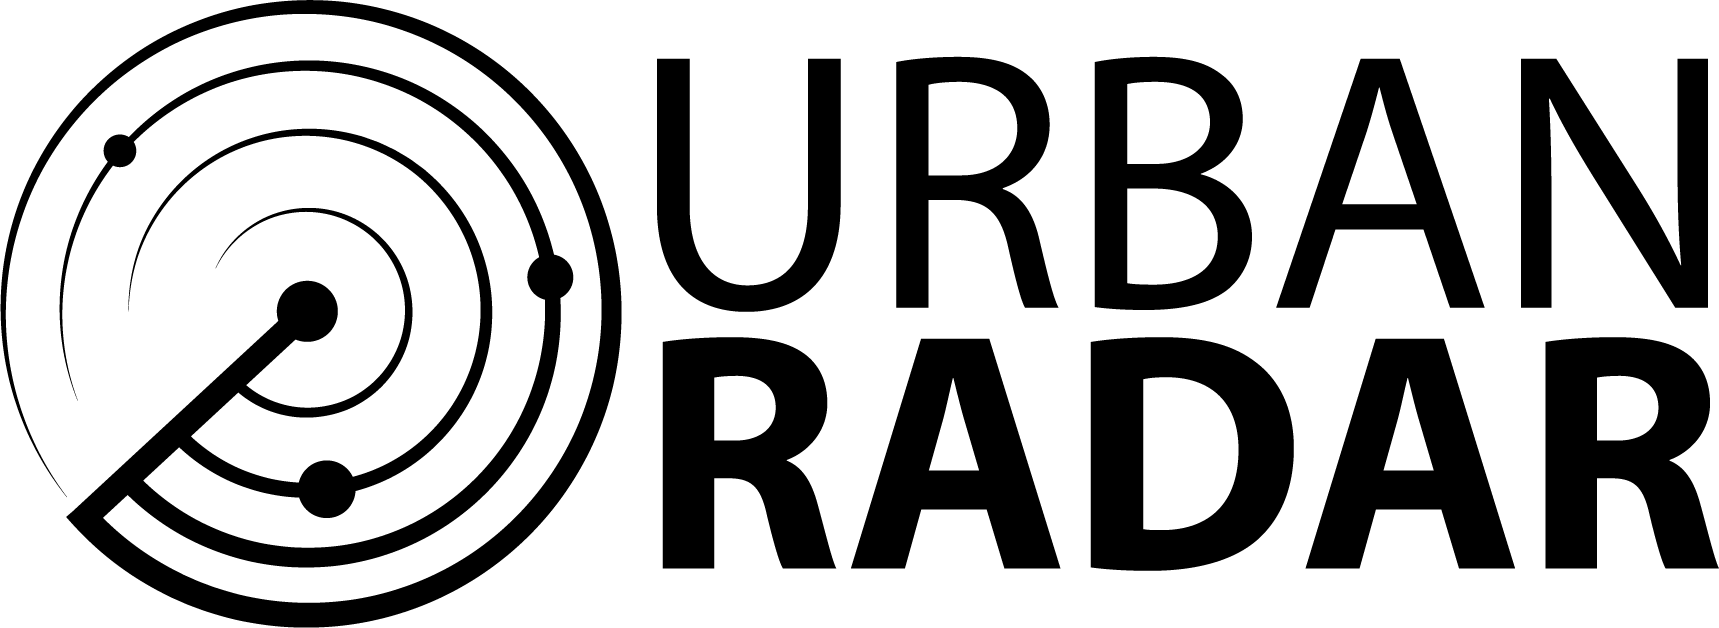 UR-logo_02_writeBigSide_black